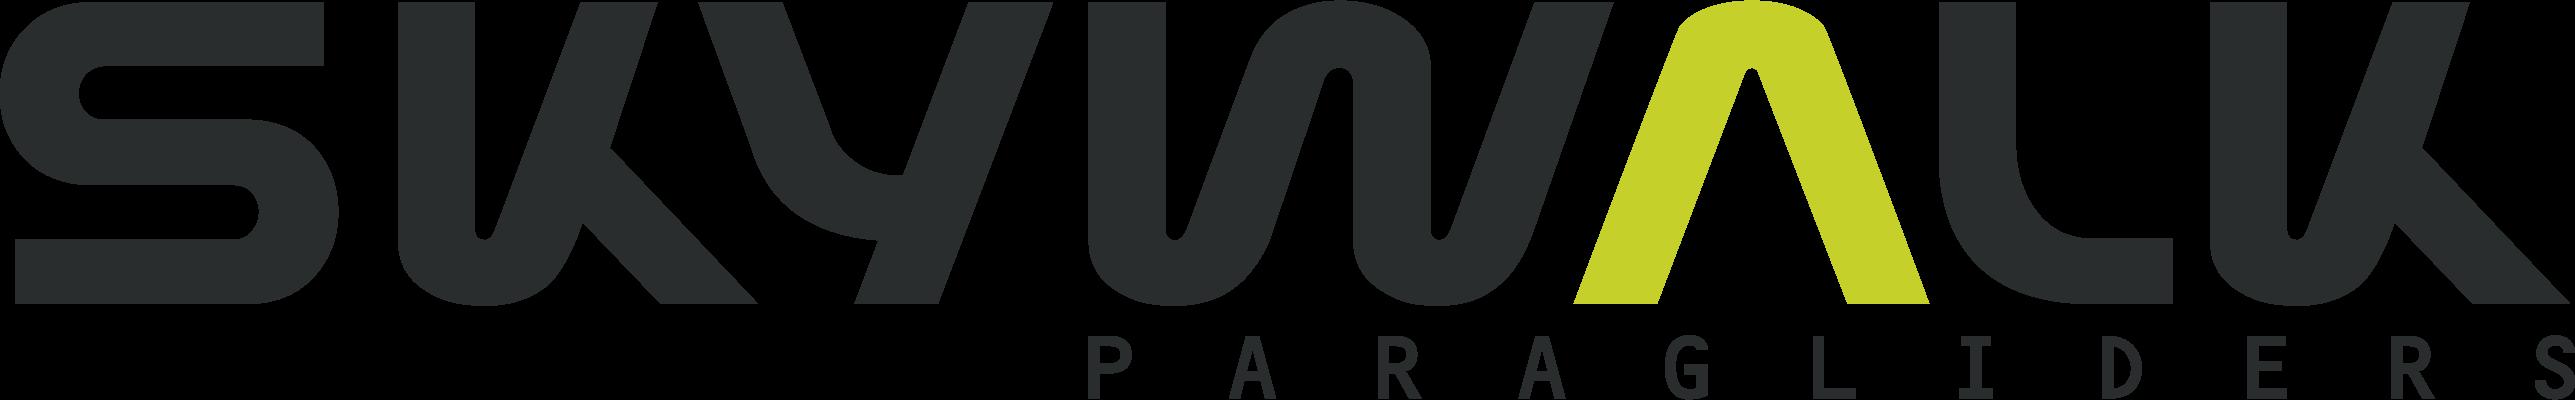 skywall_logo